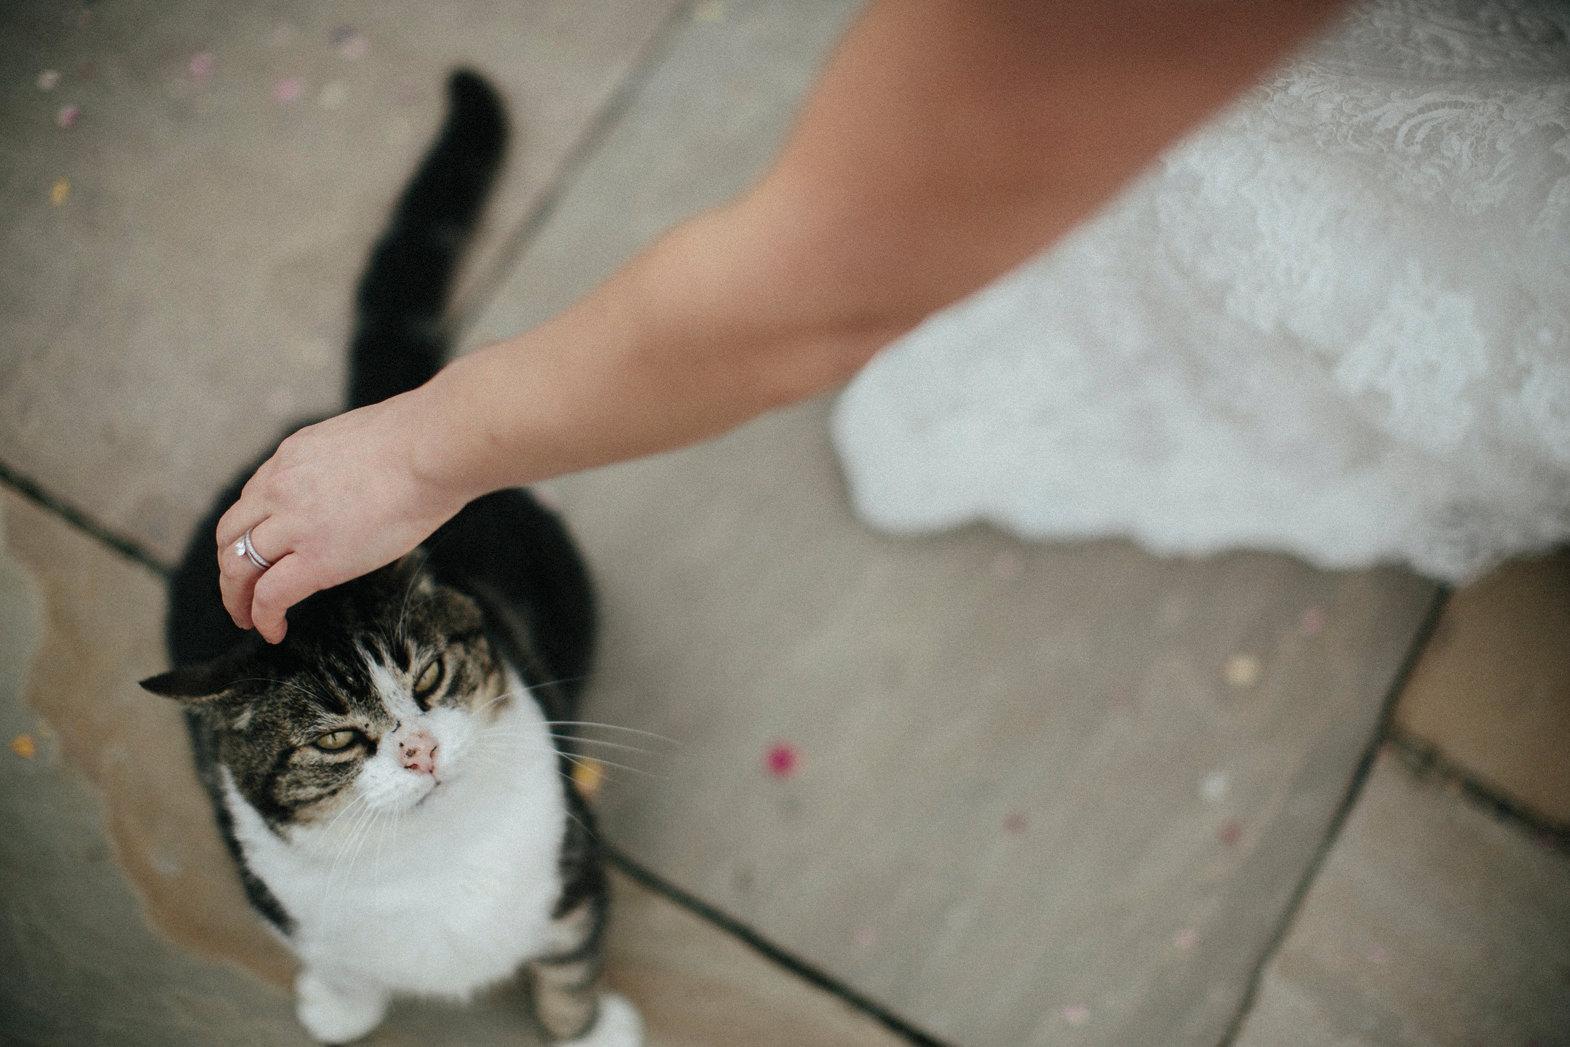 WEDDING PHOTOGRAPHy AT LOWER BARN (84).jpg